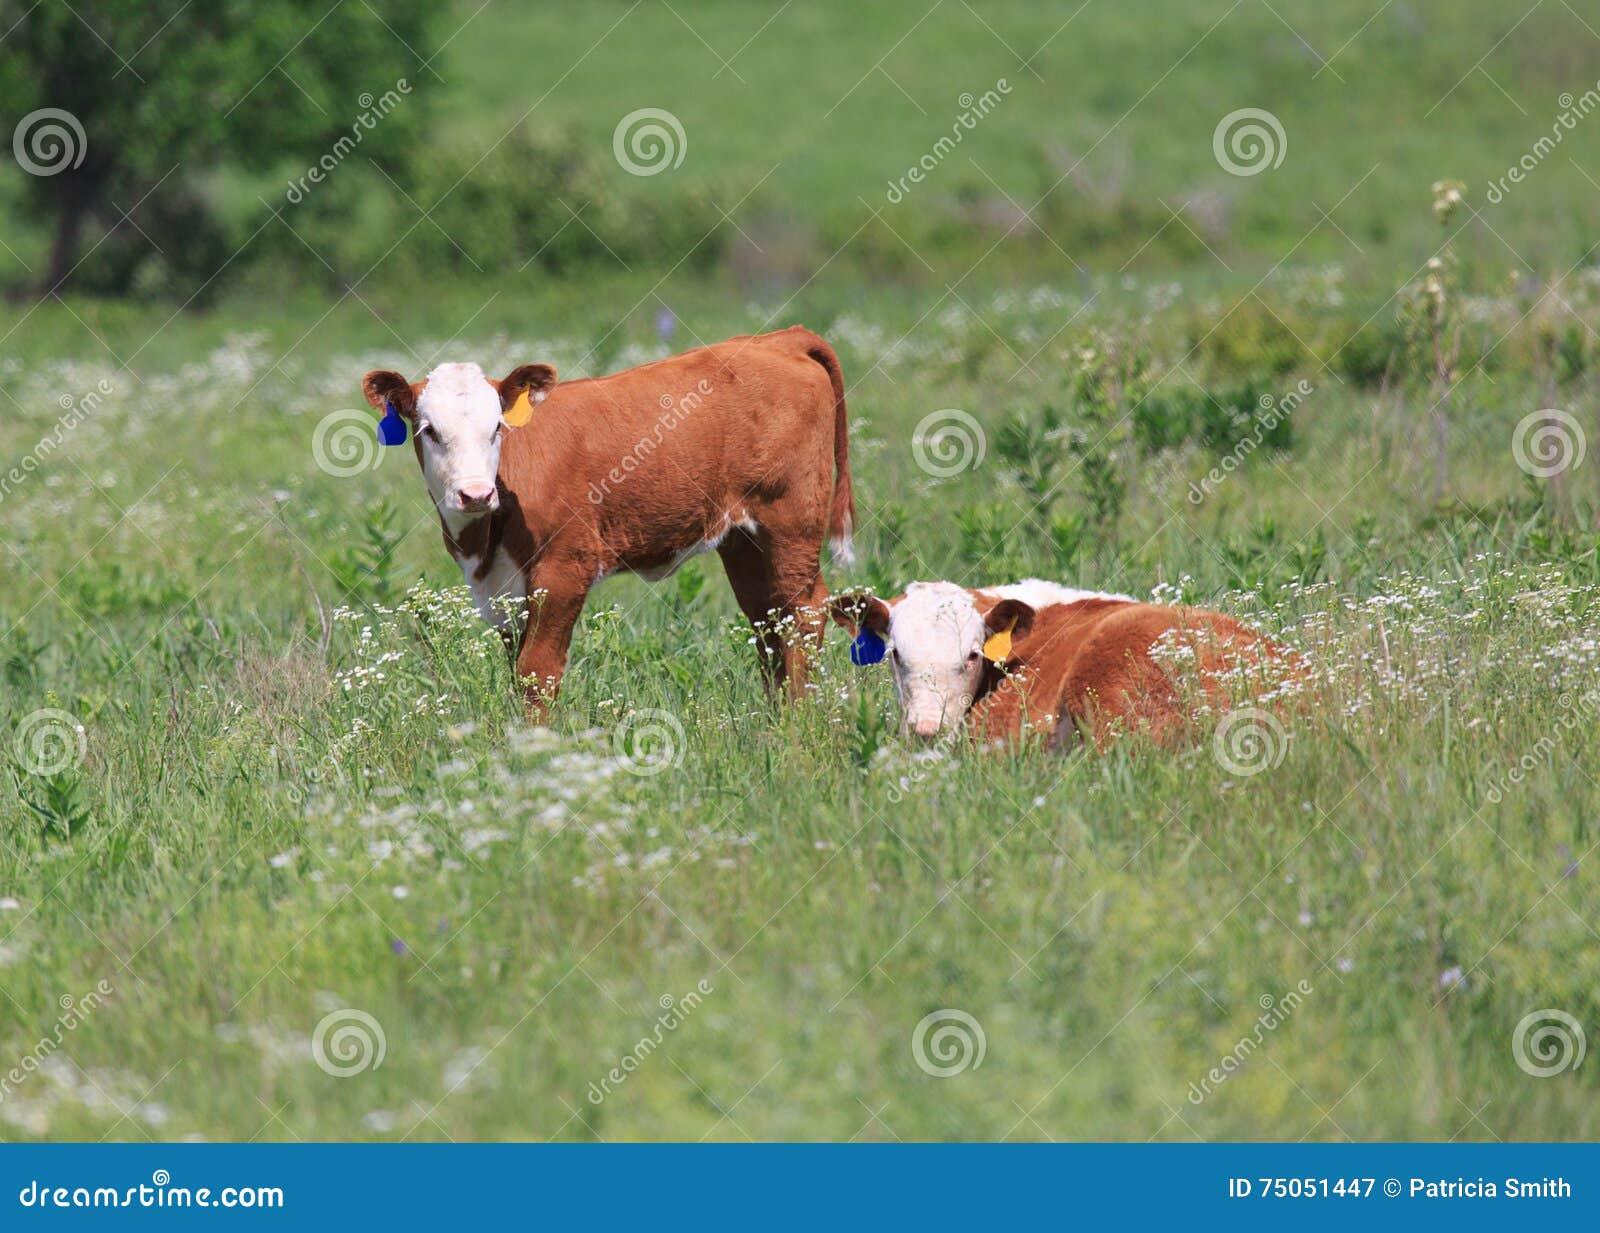 Two Hereford calves